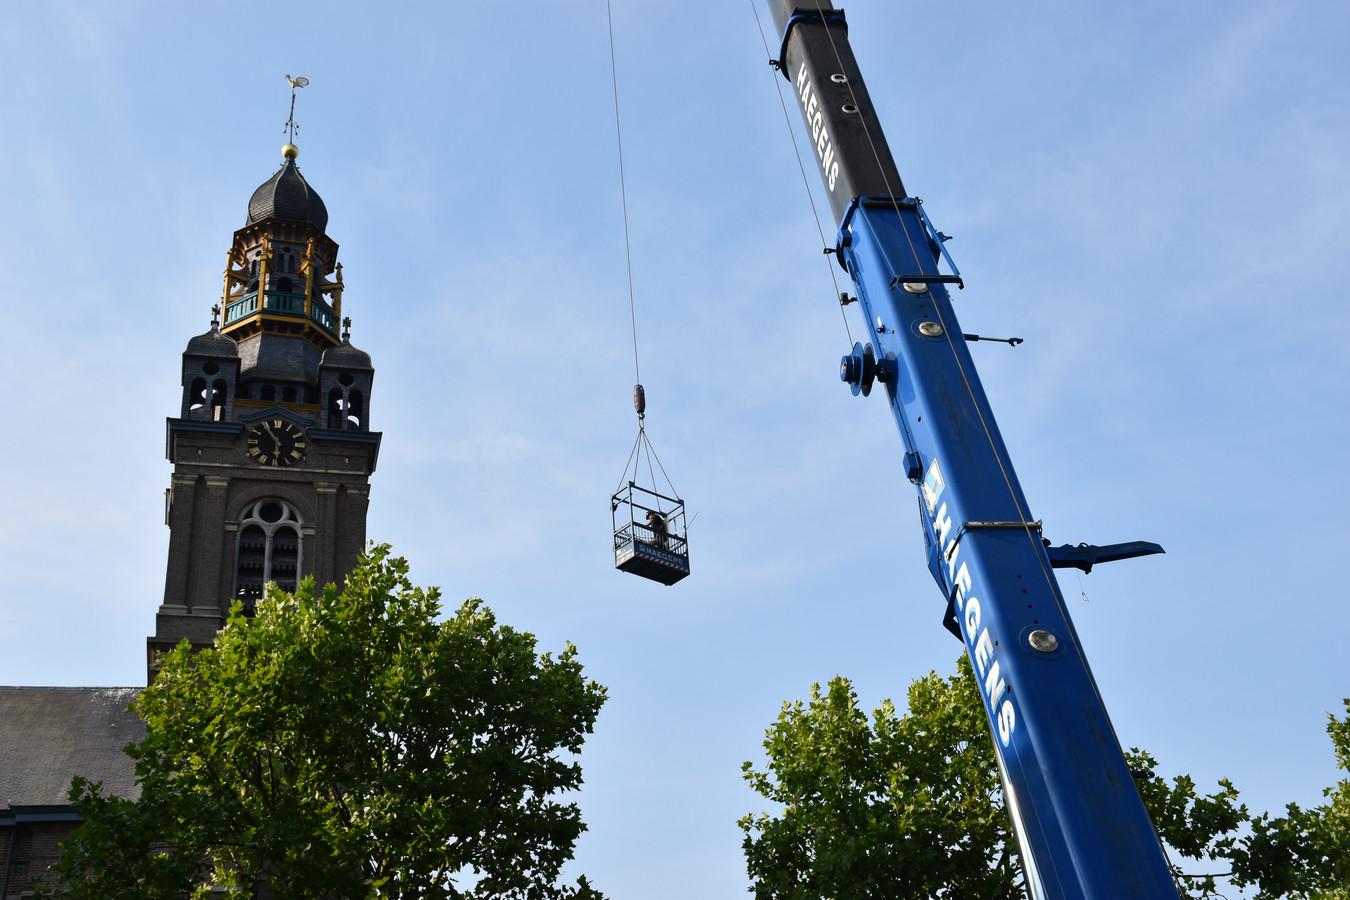 Het grote carillon speelt straks meer dan honderd liedjes.